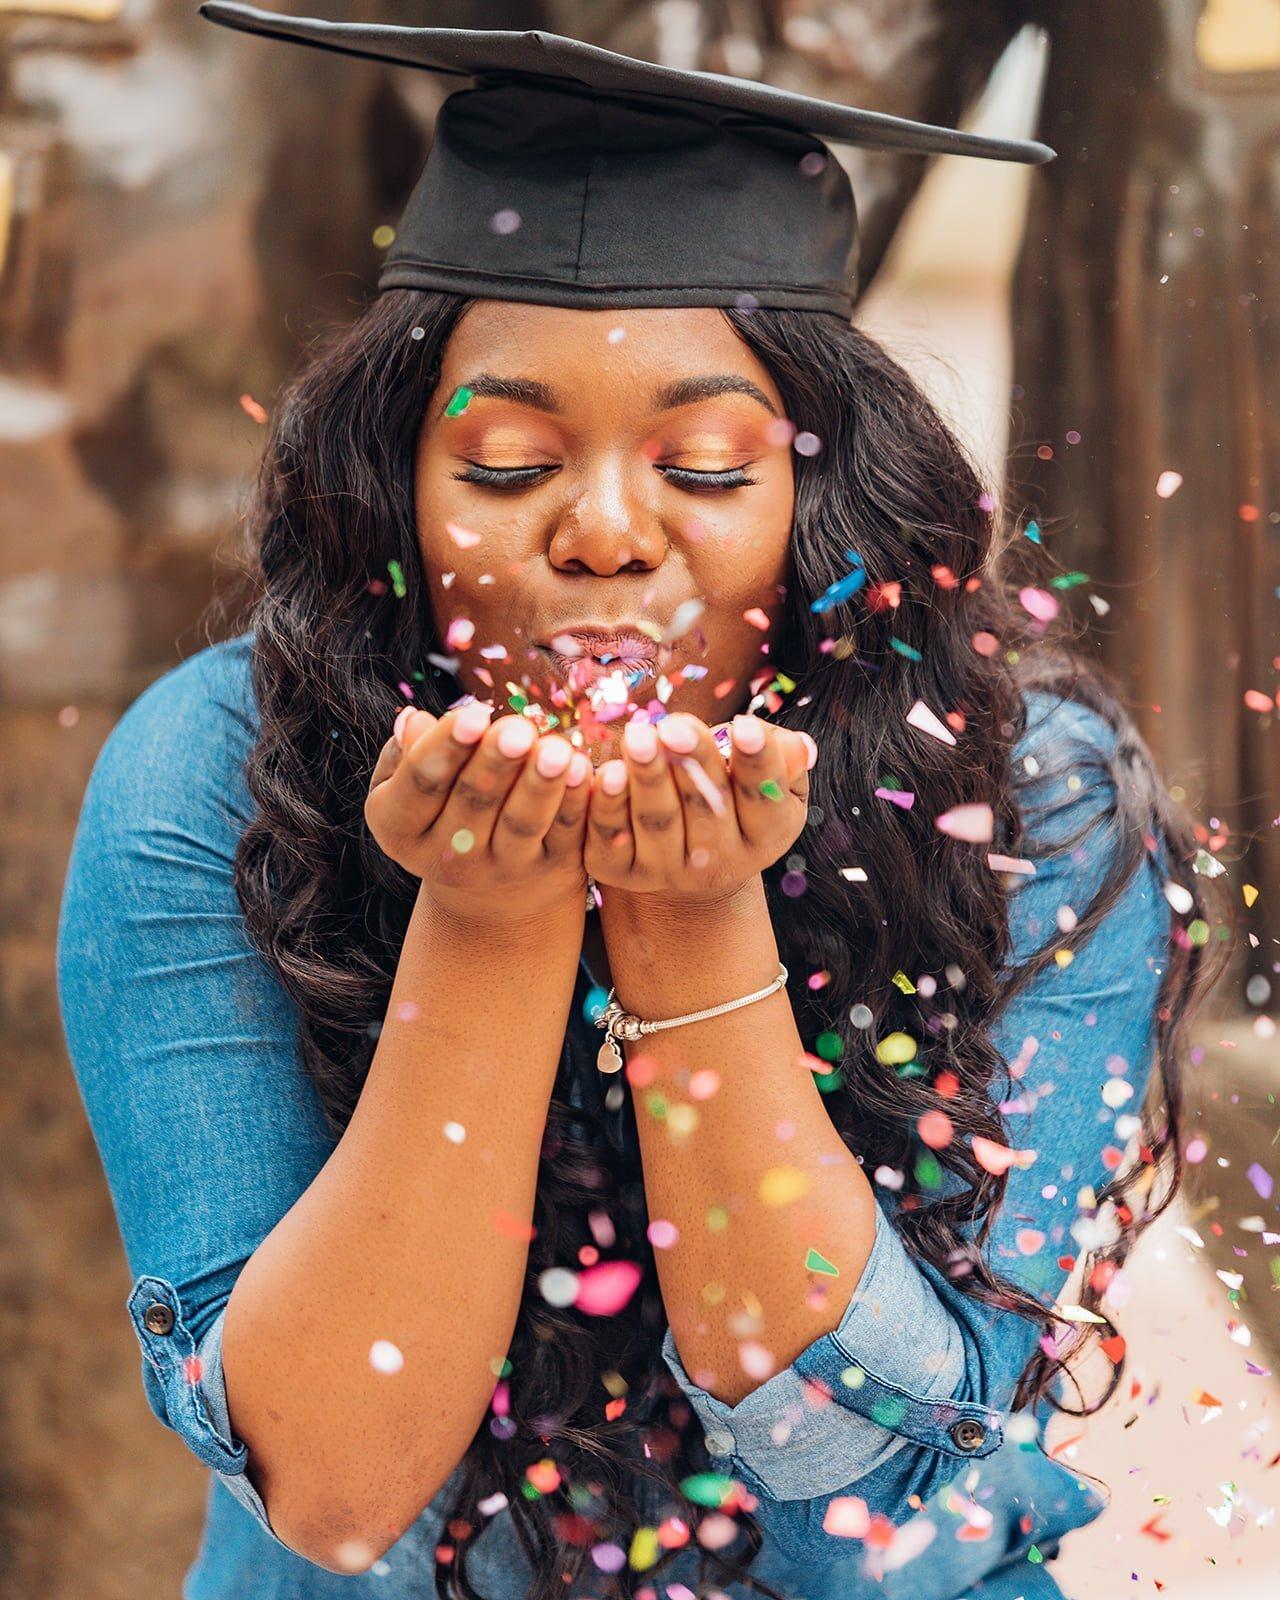 Graduation photoshoot with confetti.